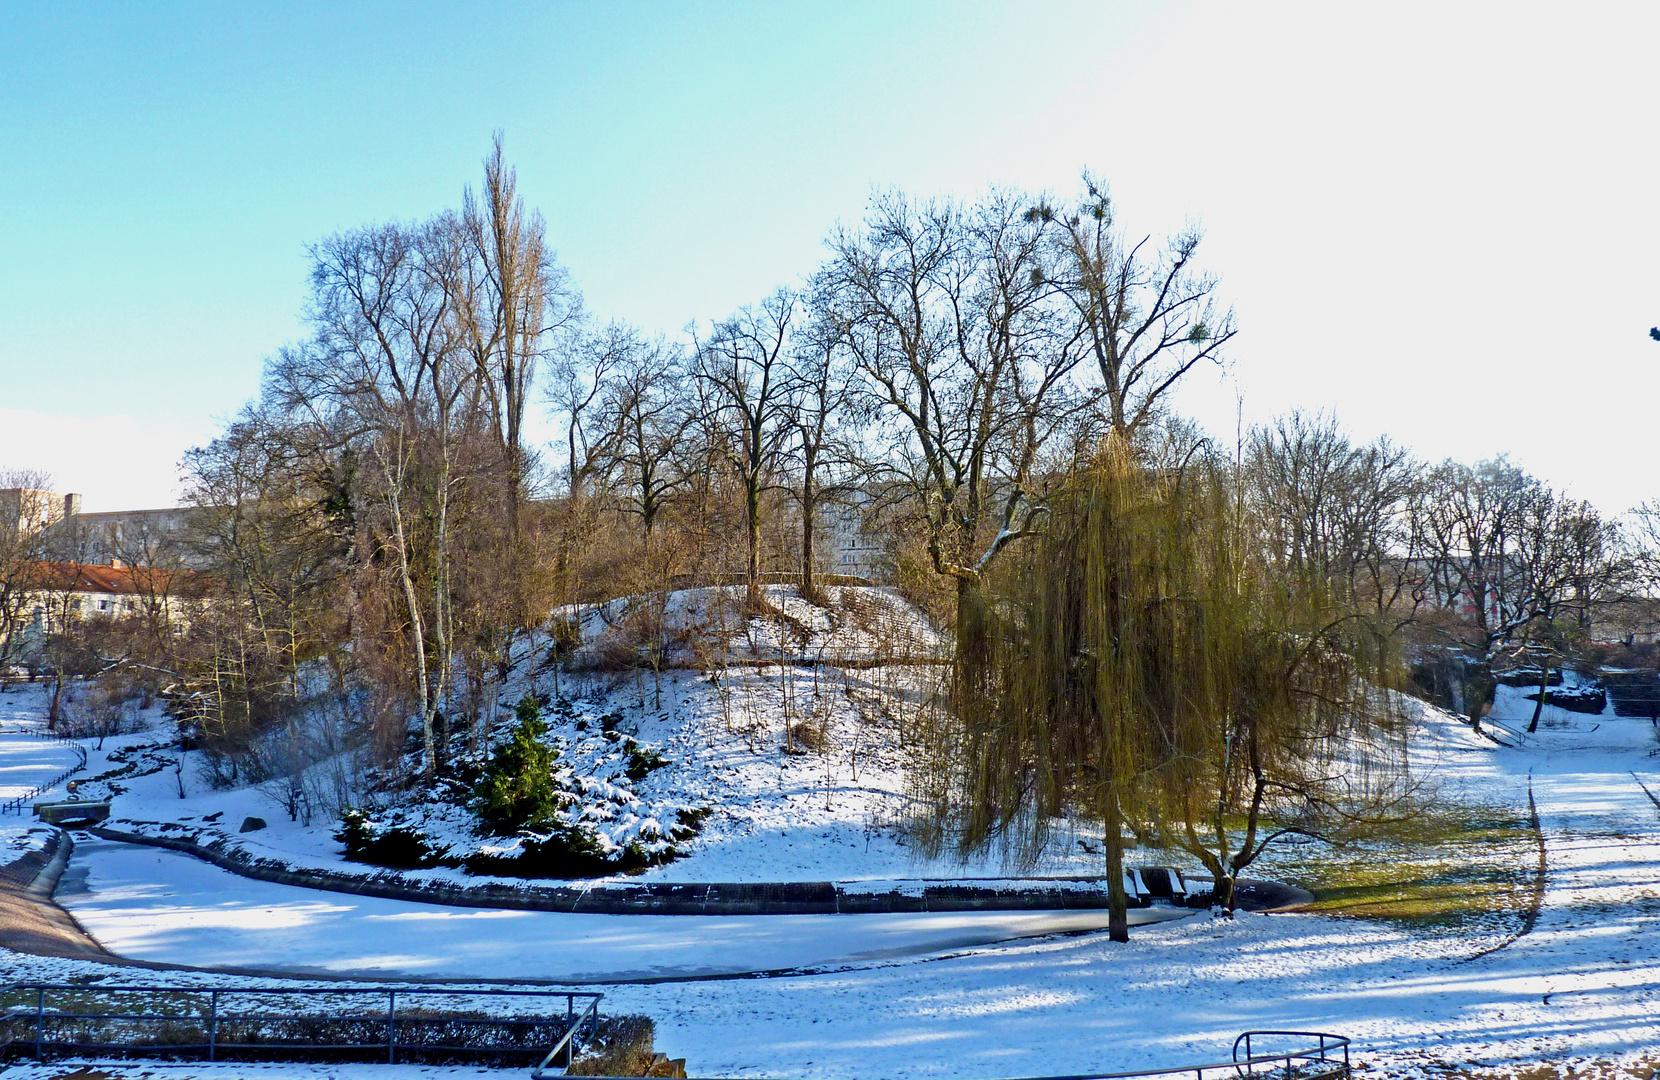 Luisenpark heute Nachmittag